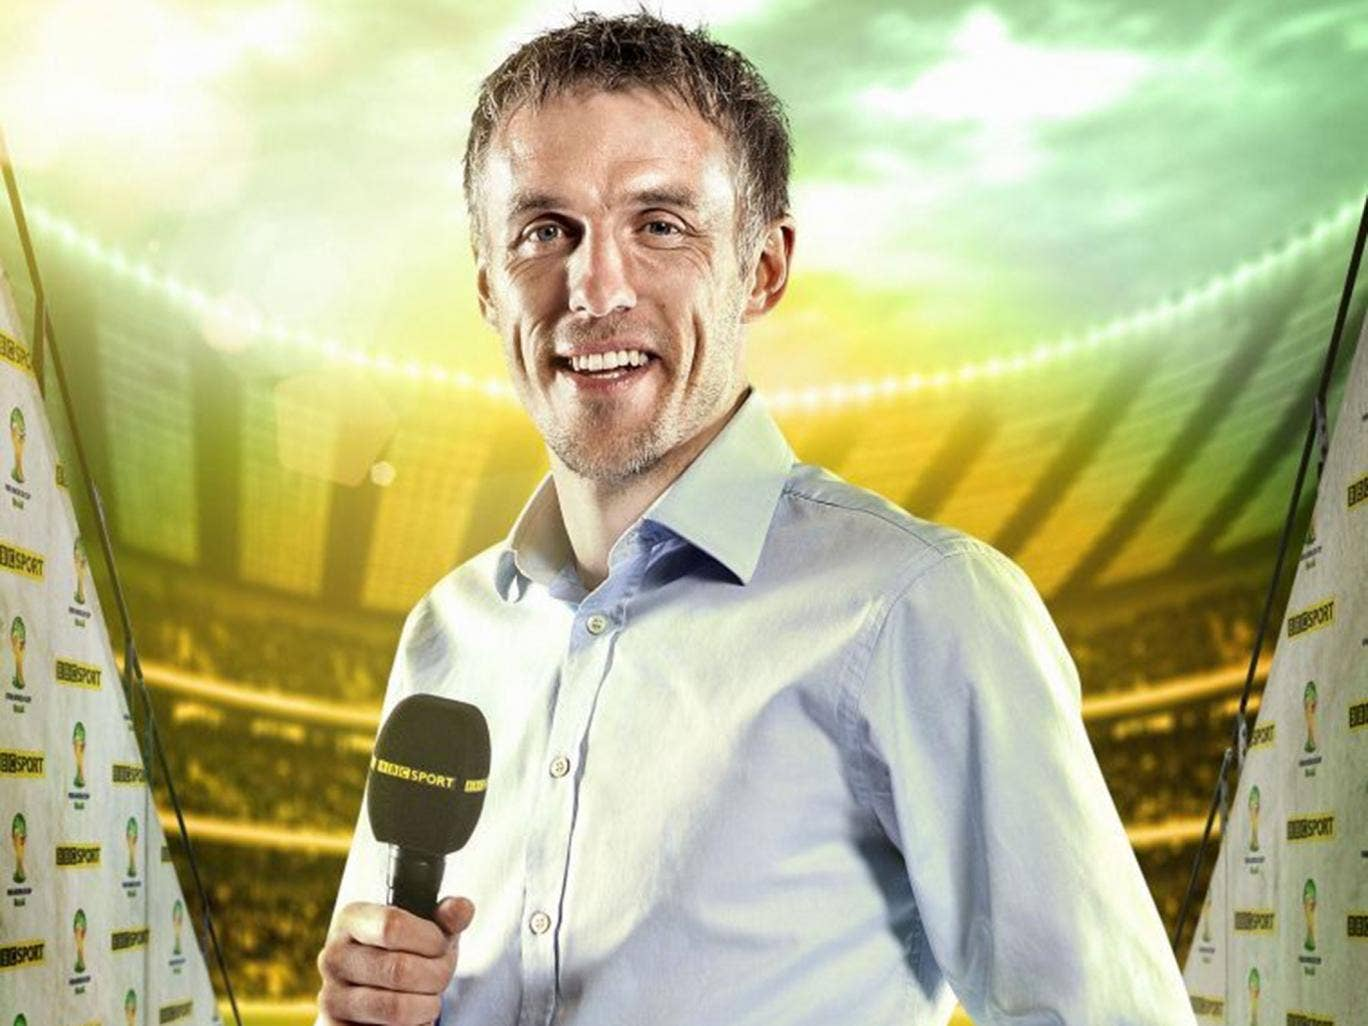 BBC pundit Phil Neville